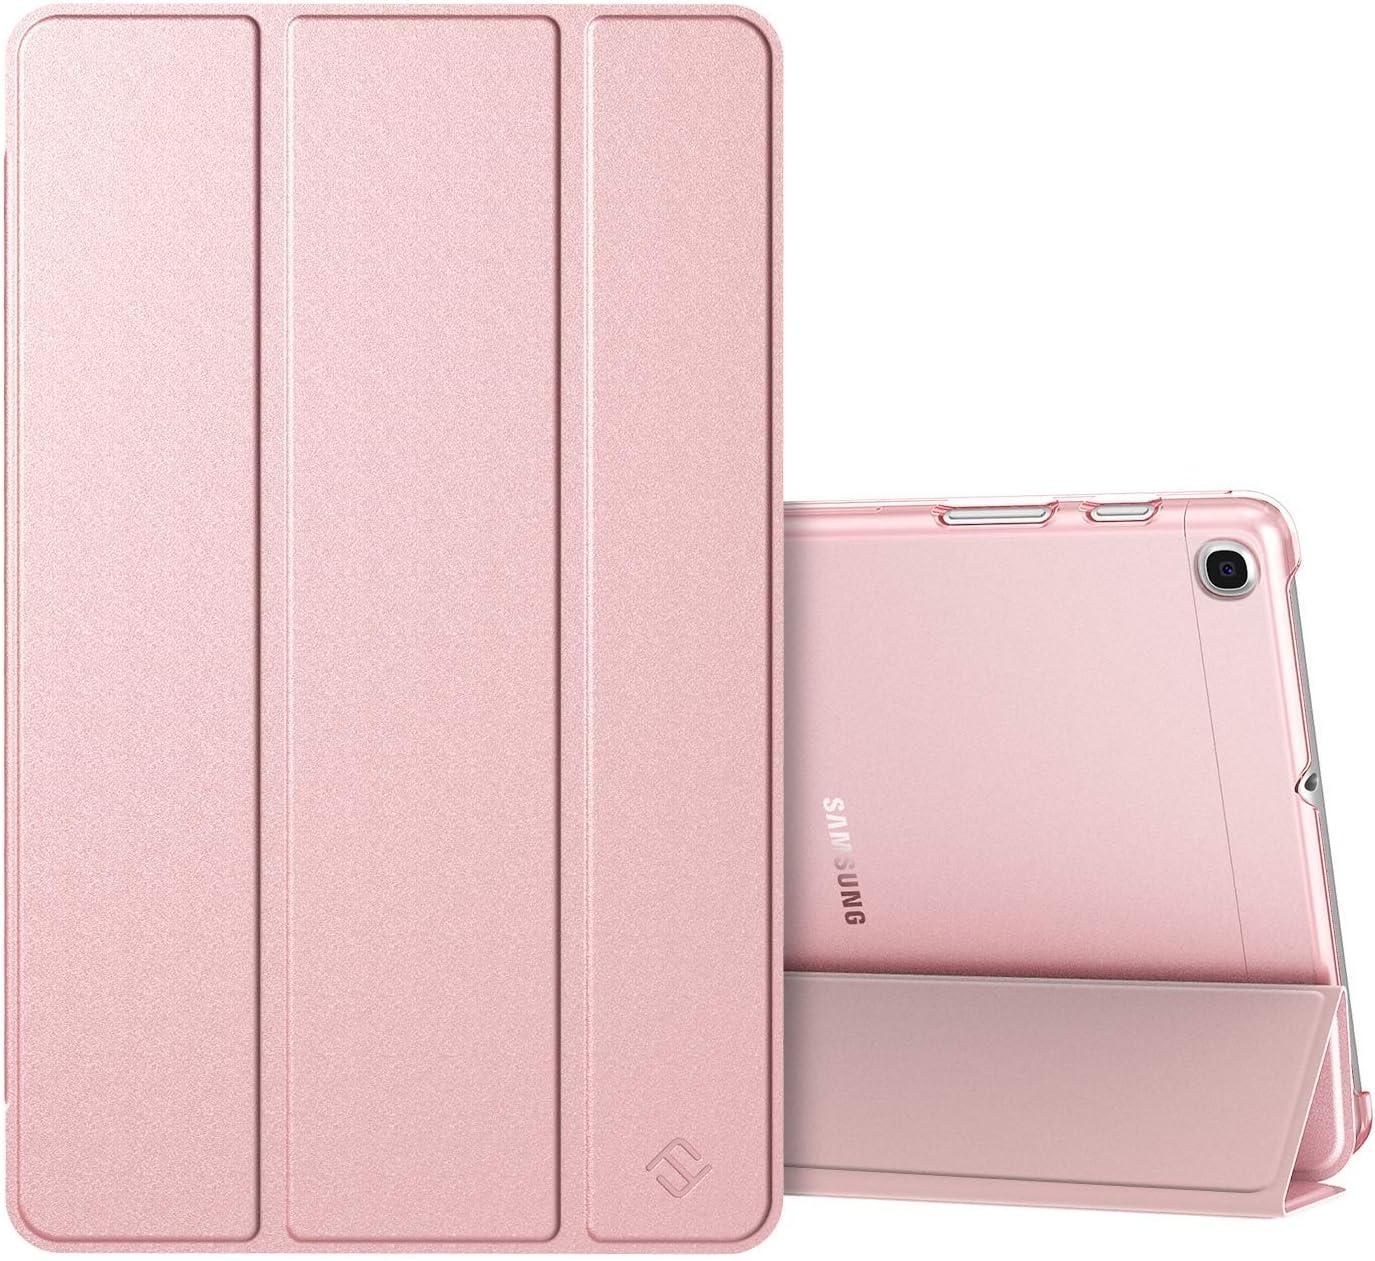 Fintie Funda Compatible con Samsung Galaxy Tab A 10.1 2019 - Trasera Transparente Mate Carcasa Ligera con Función de Soporte para Modelo de SM-T510/T515, Oro Rosa